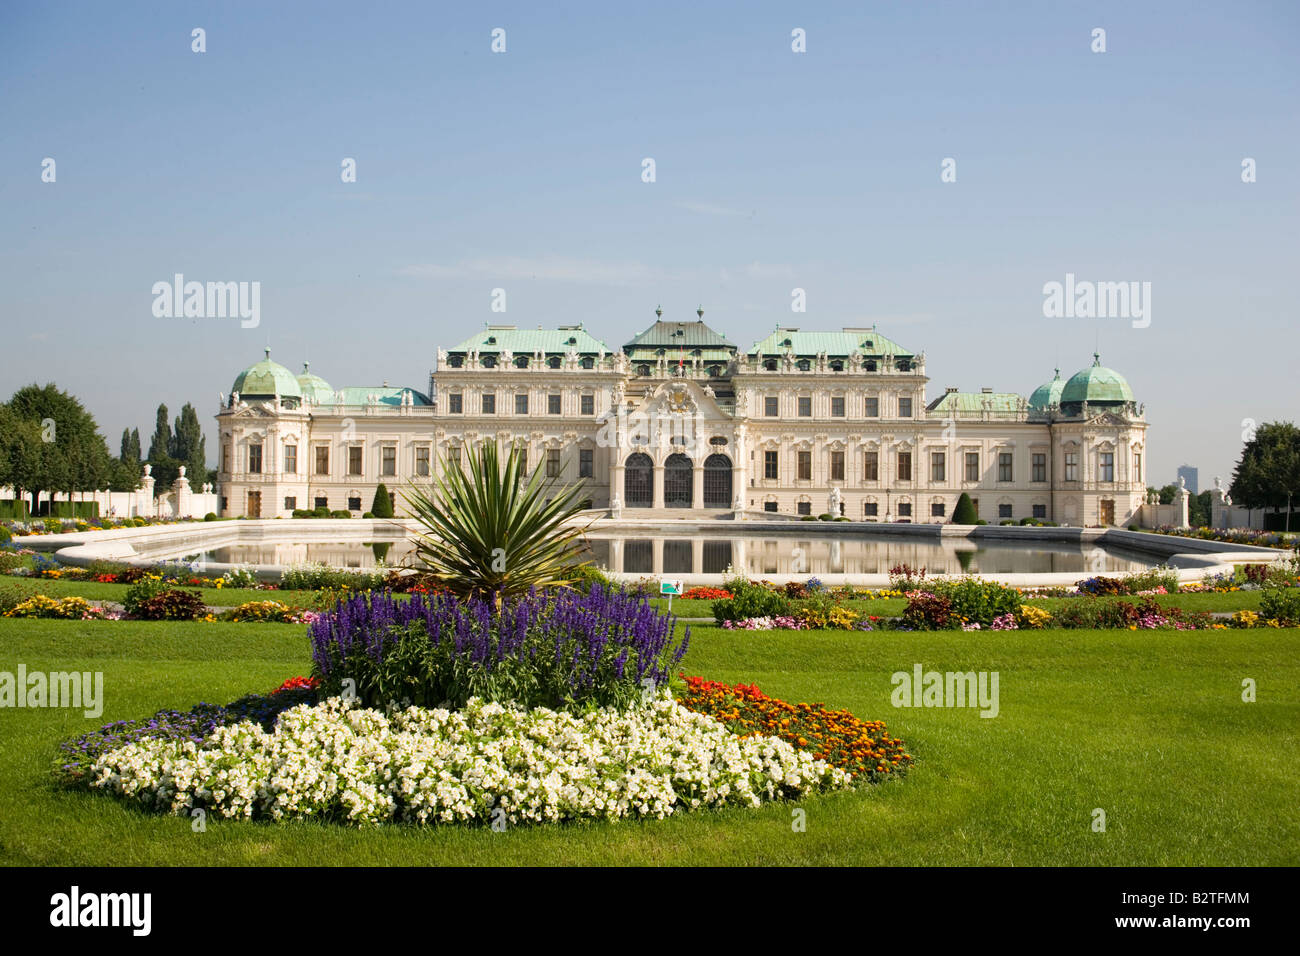 Schloss Belvedere, the home of Prince Eugene of Savoy, Vienna, Austria Stock Photo